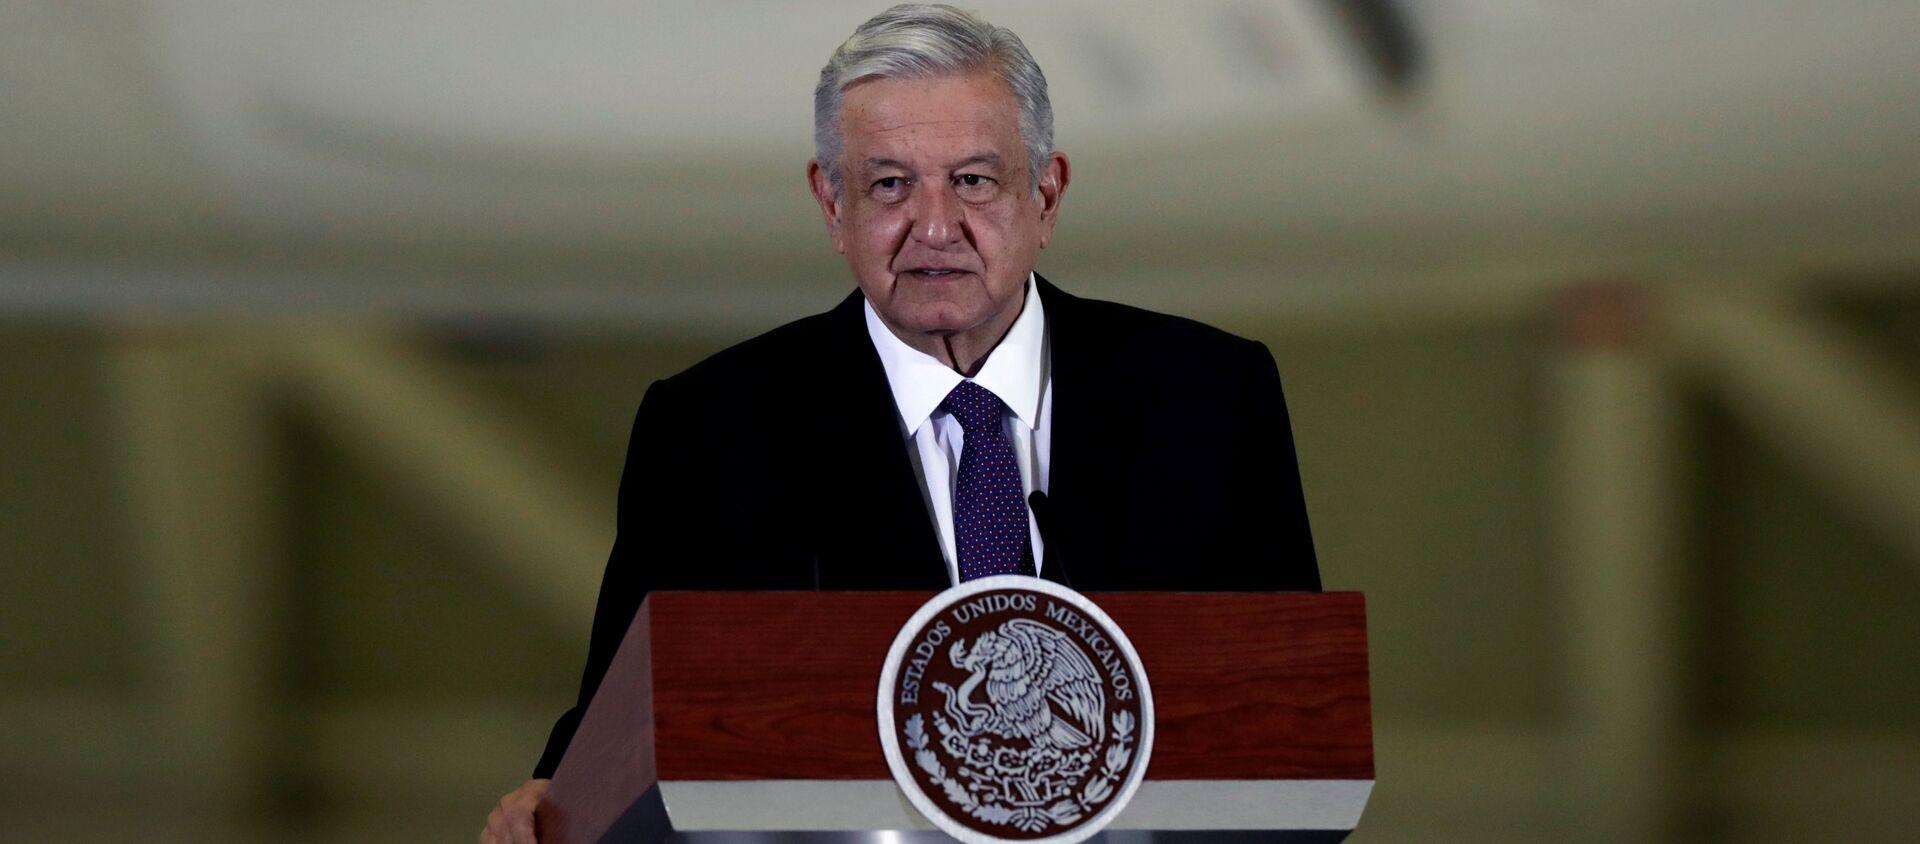 Andrés Manuel López Obrador, presidente mexicano - Sputnik Mundo, 1920, 20.08.2020